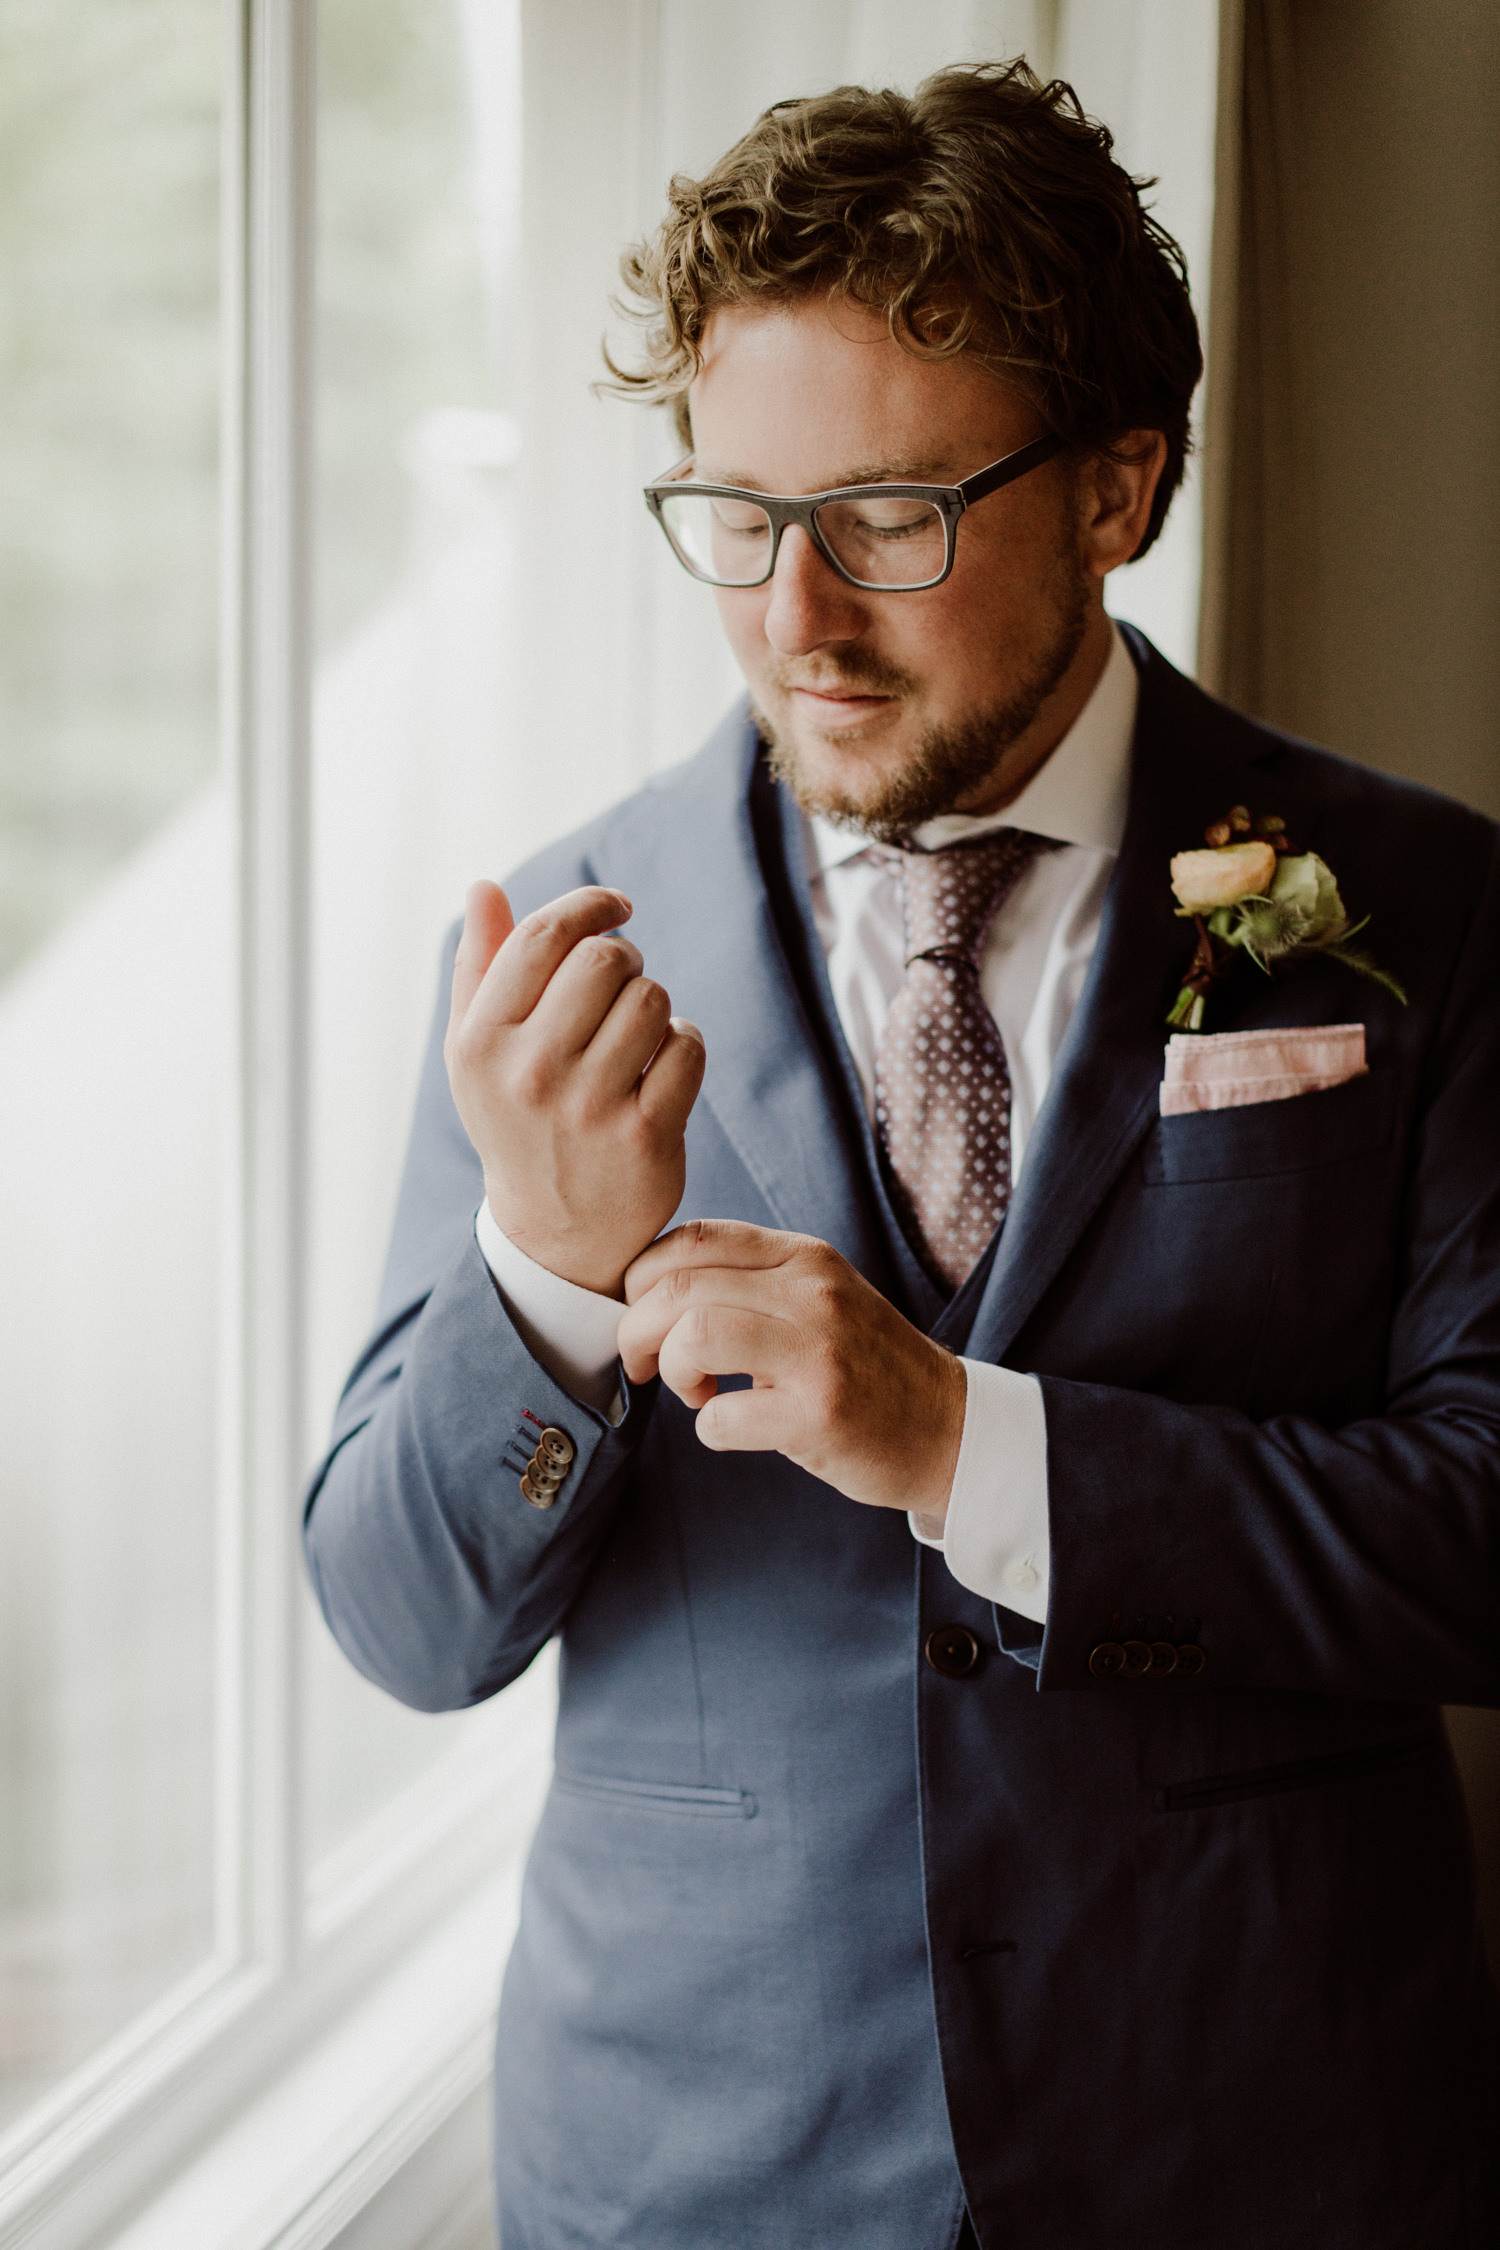 03_bohemian-wedding-in-aspen-colorado-2.jpg